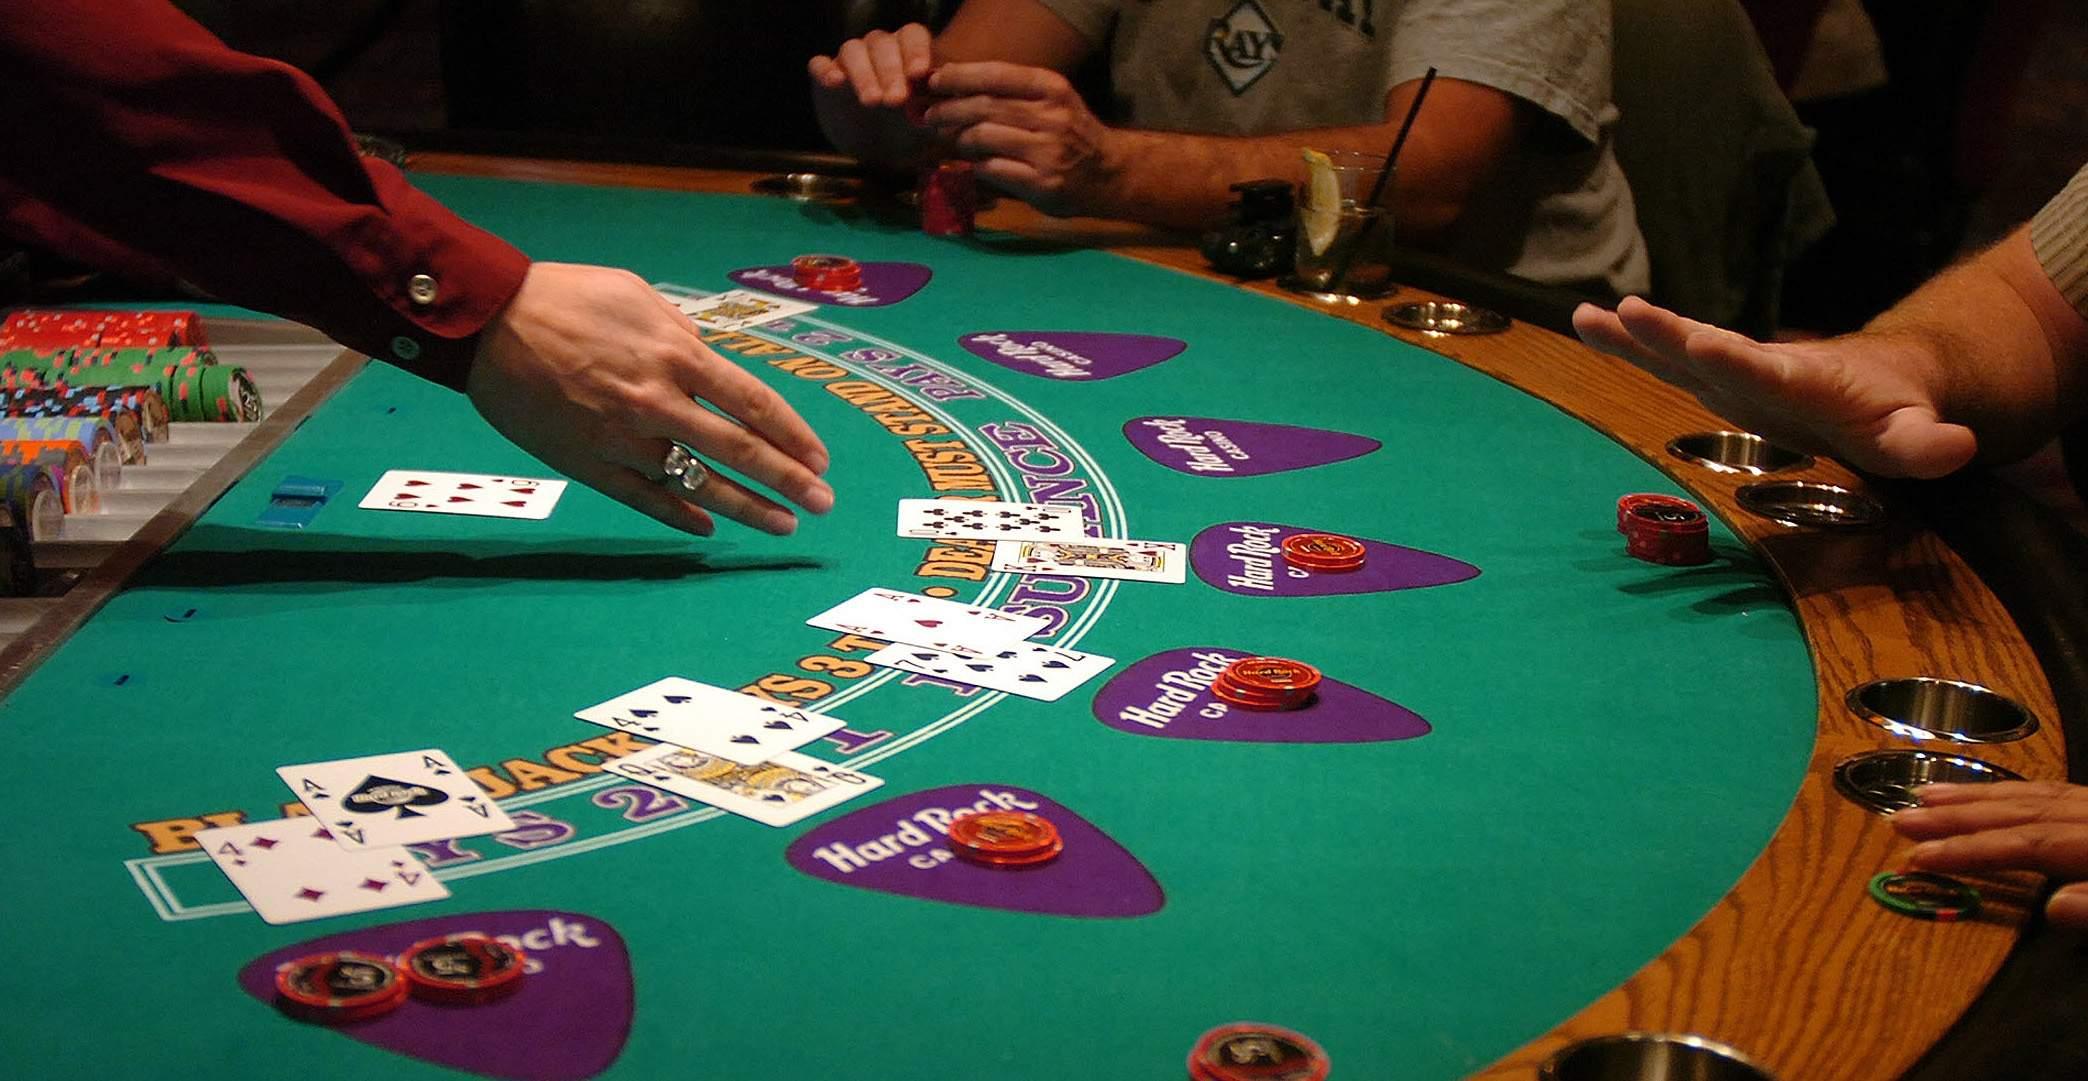 Jeux casino innovants: comment les dominer?